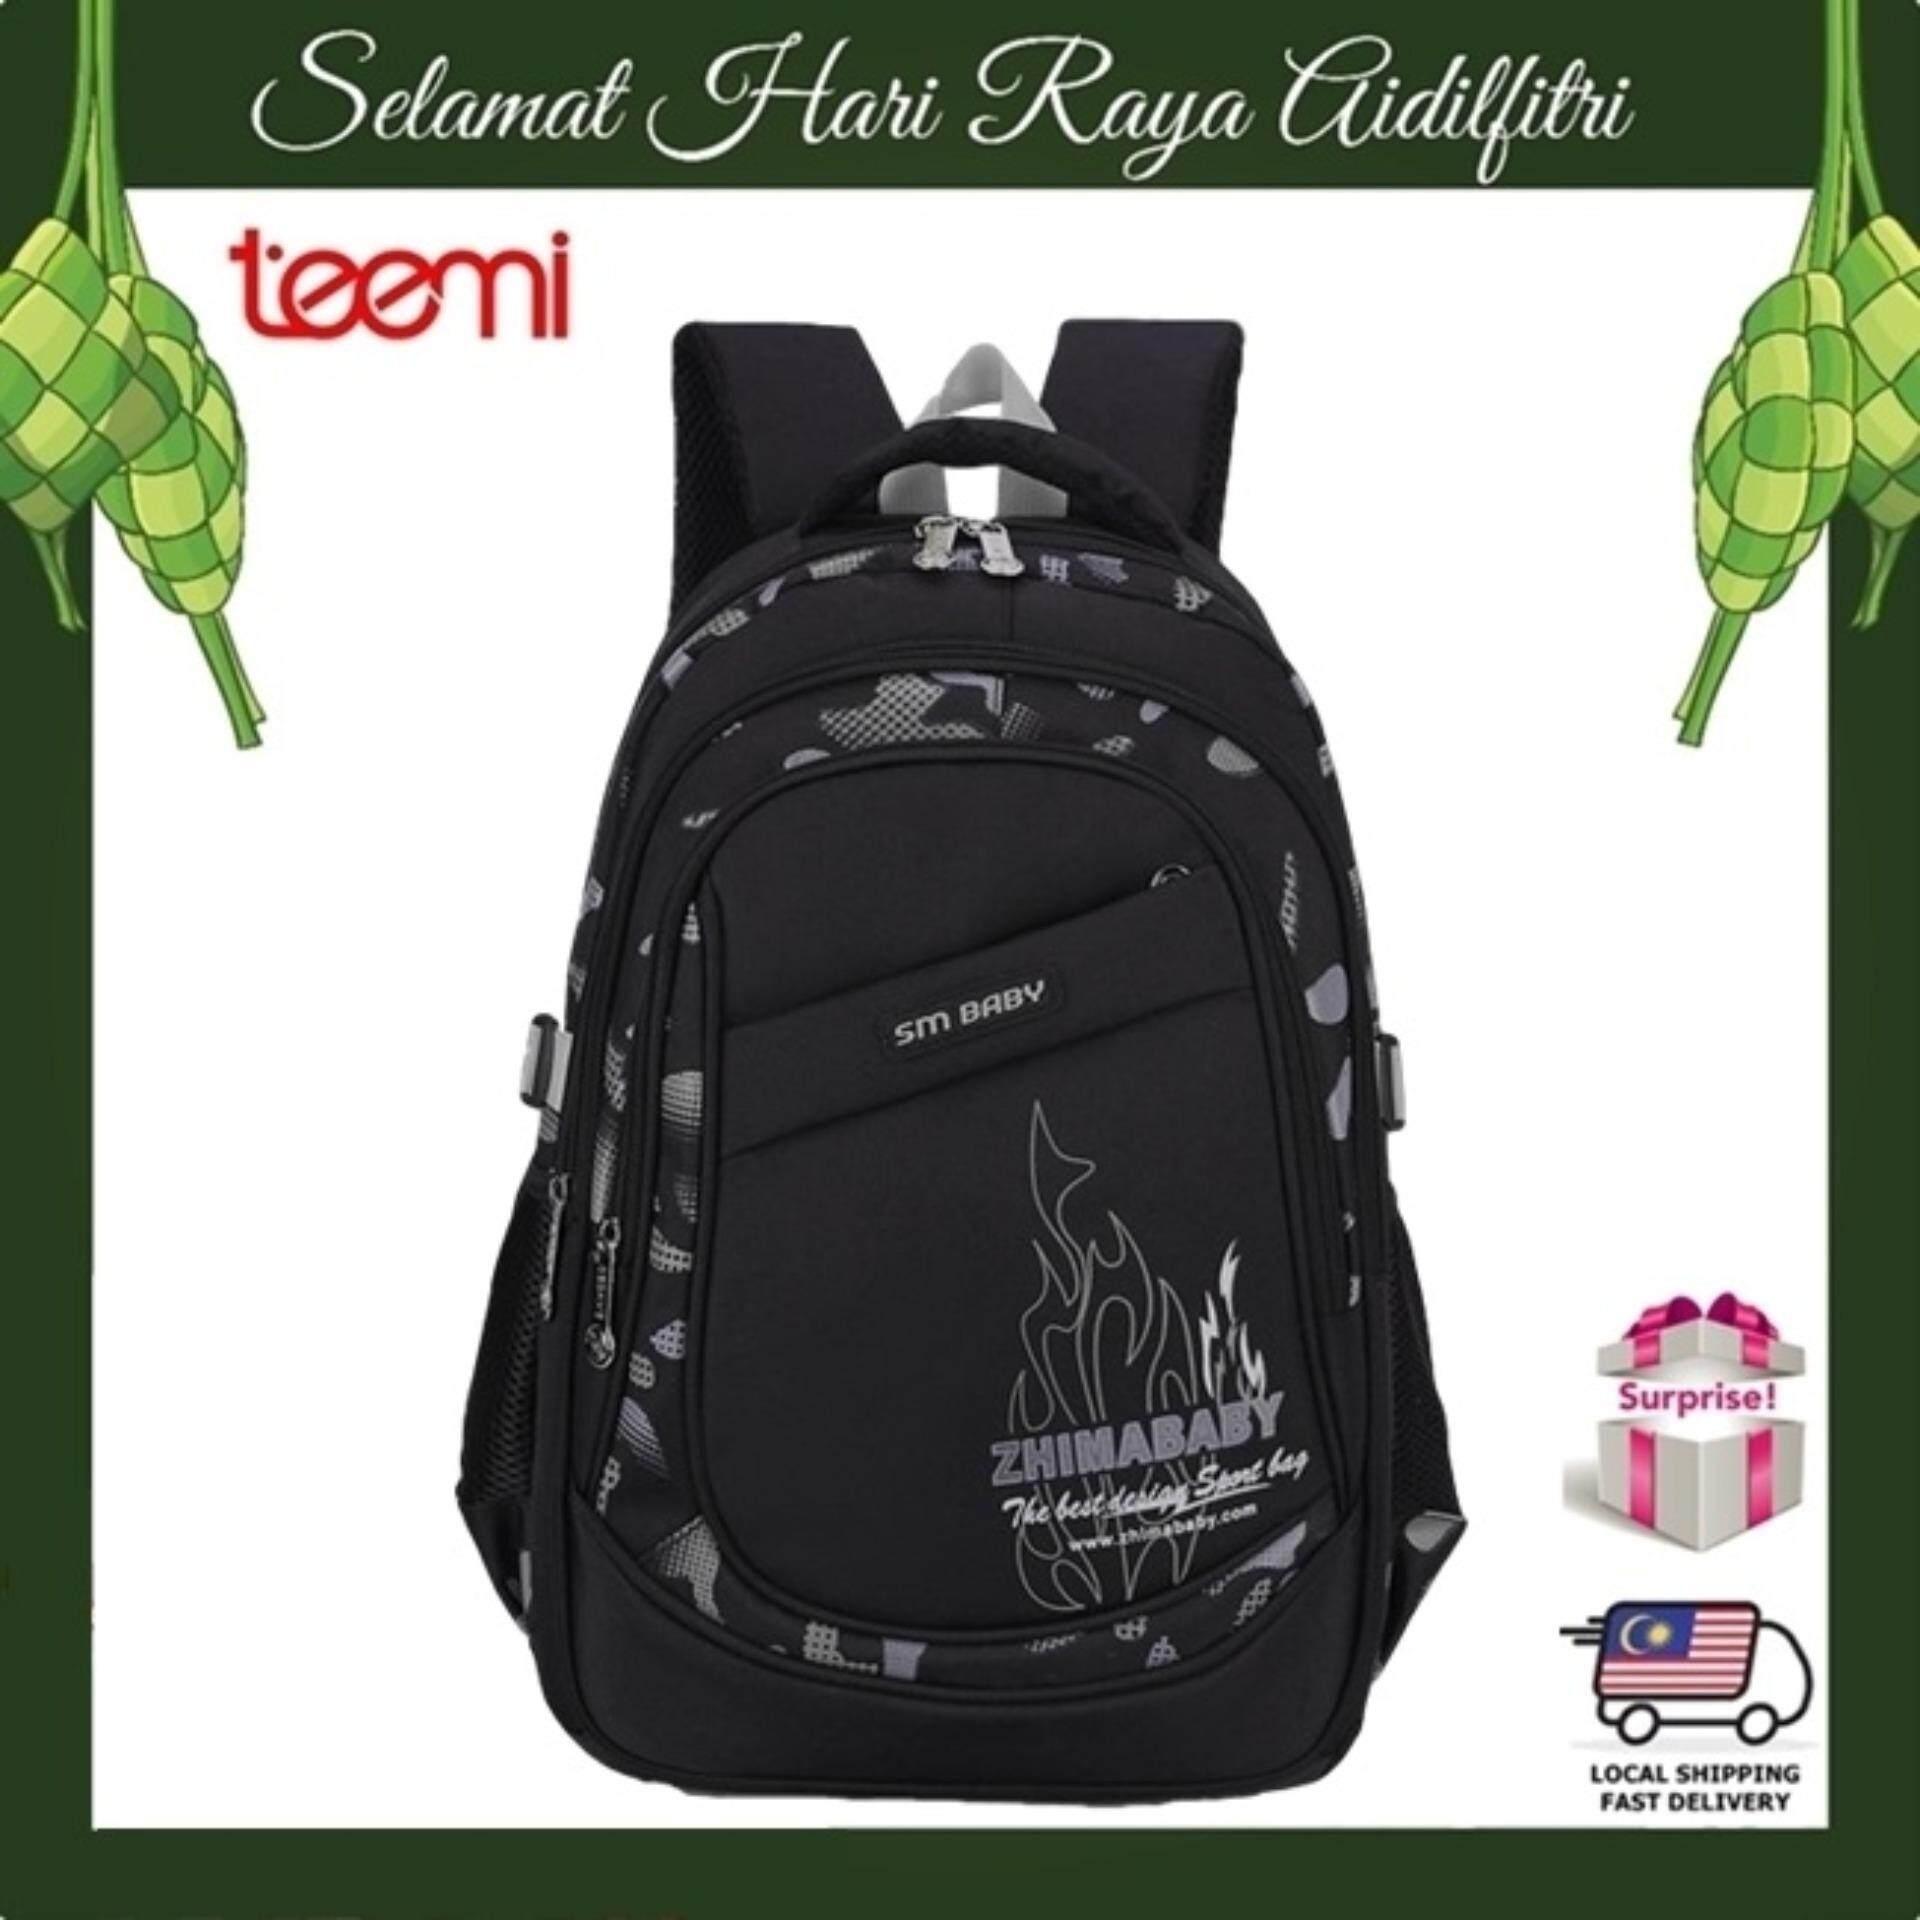 TEEMI Neon Framed Primary Secondary Nylon Water Resistant Orthopedic School Bag Kids Children Backpack - Grey